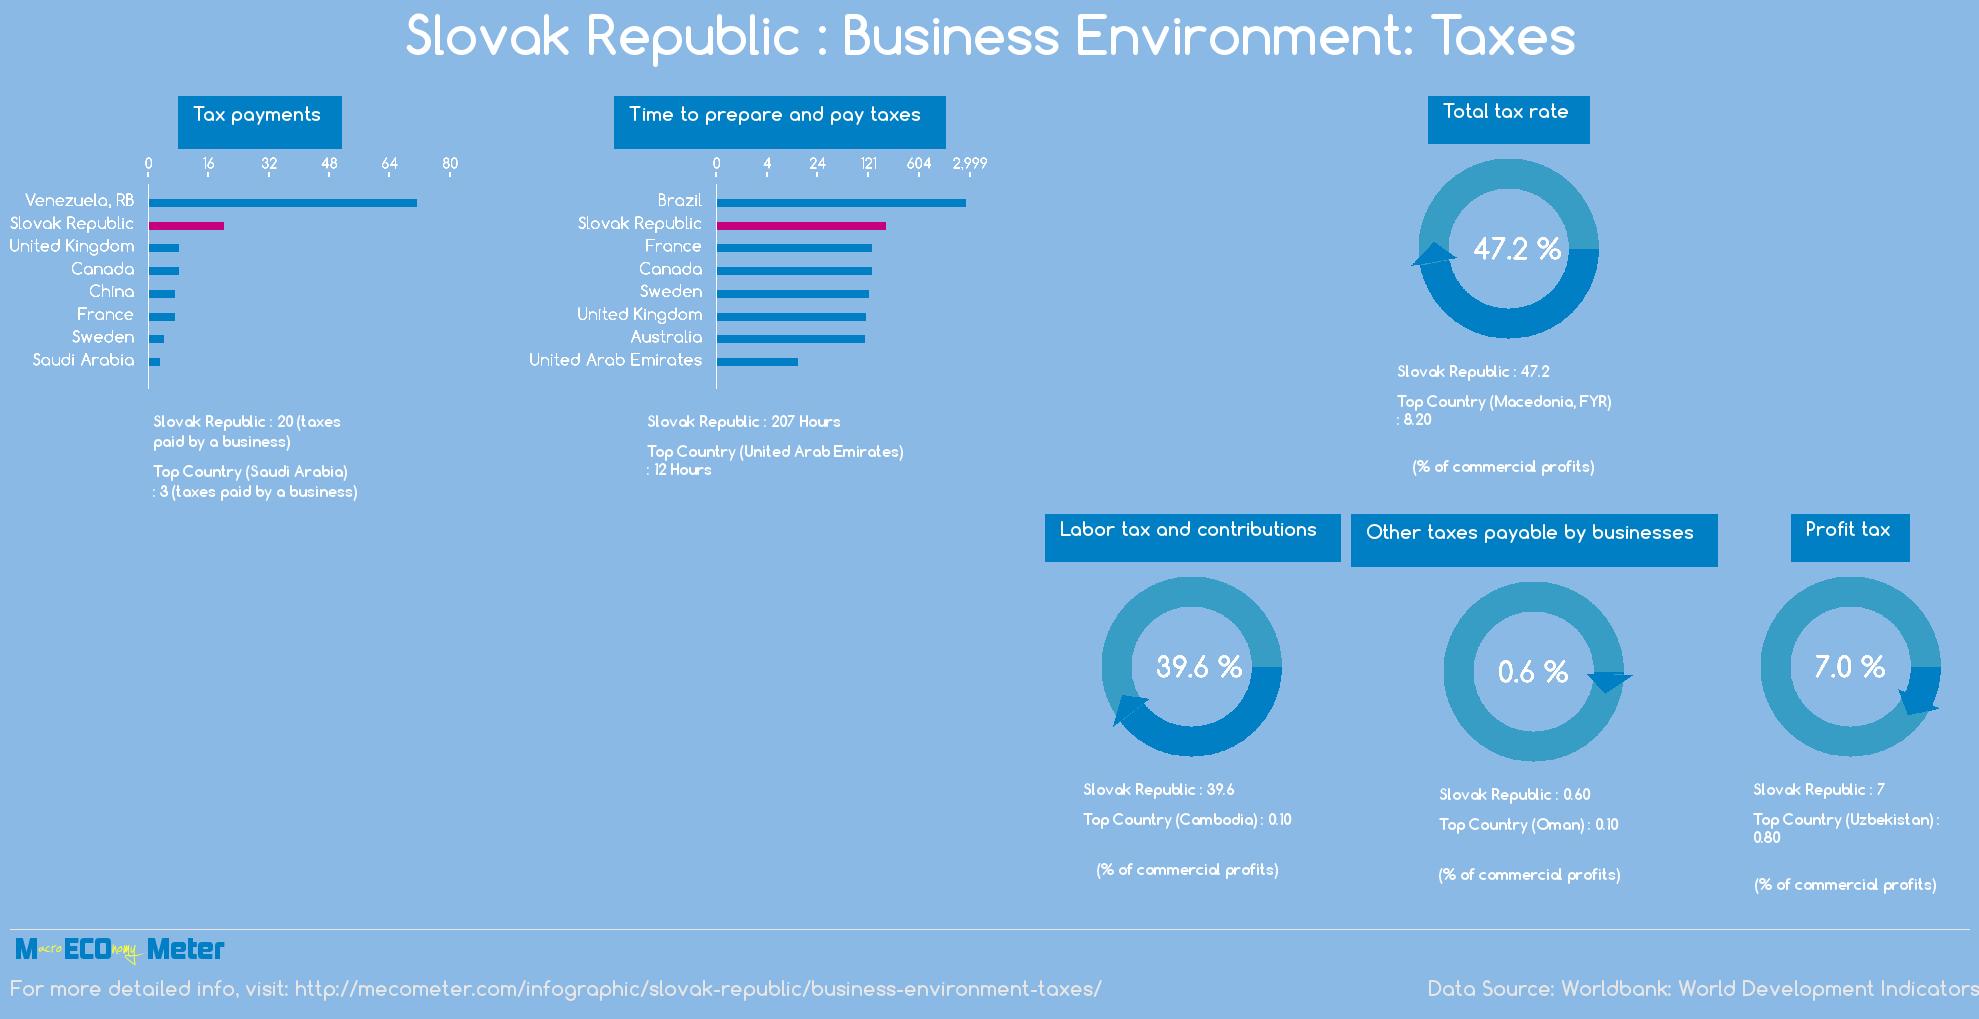 Slovak Republic : Business Environment: Taxes